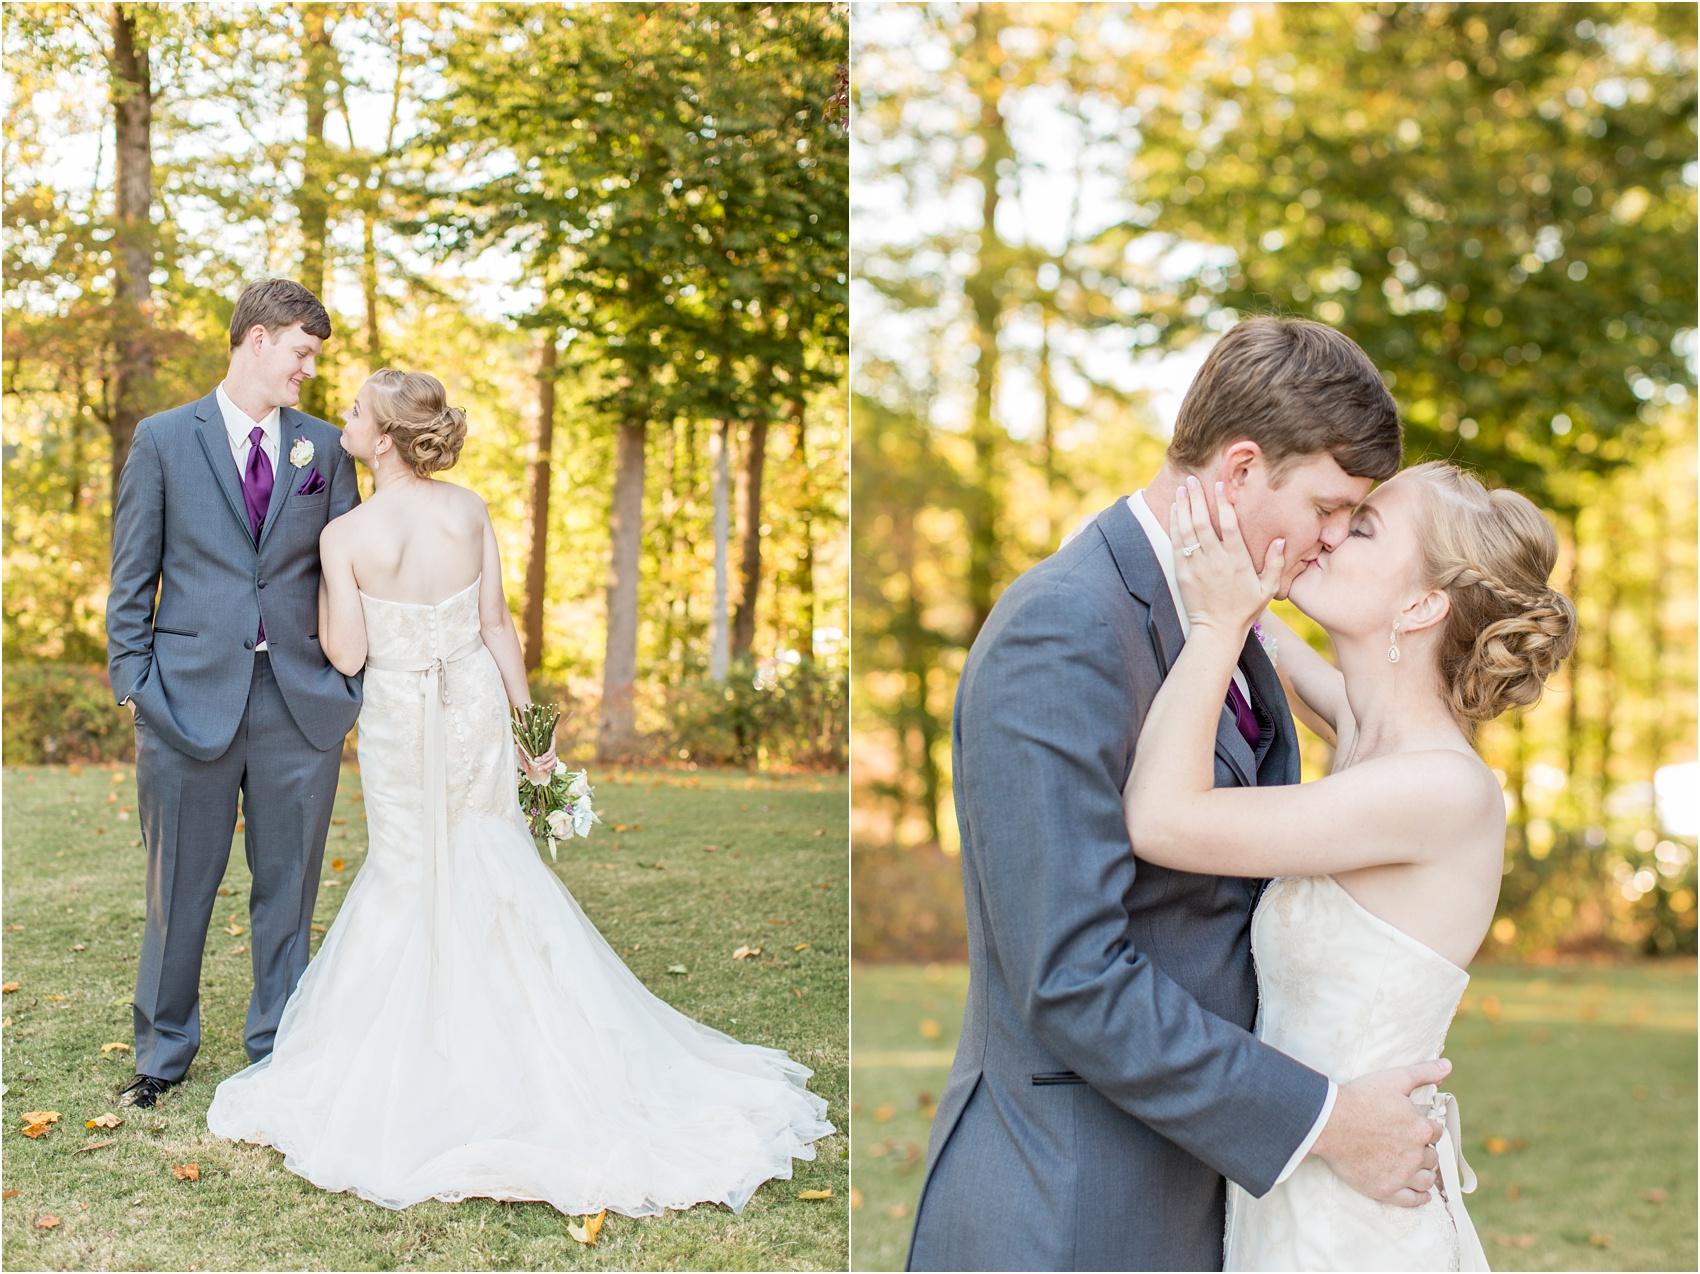 Savannah Eve Photography- Perkins Wedding- Blog-29.jpg